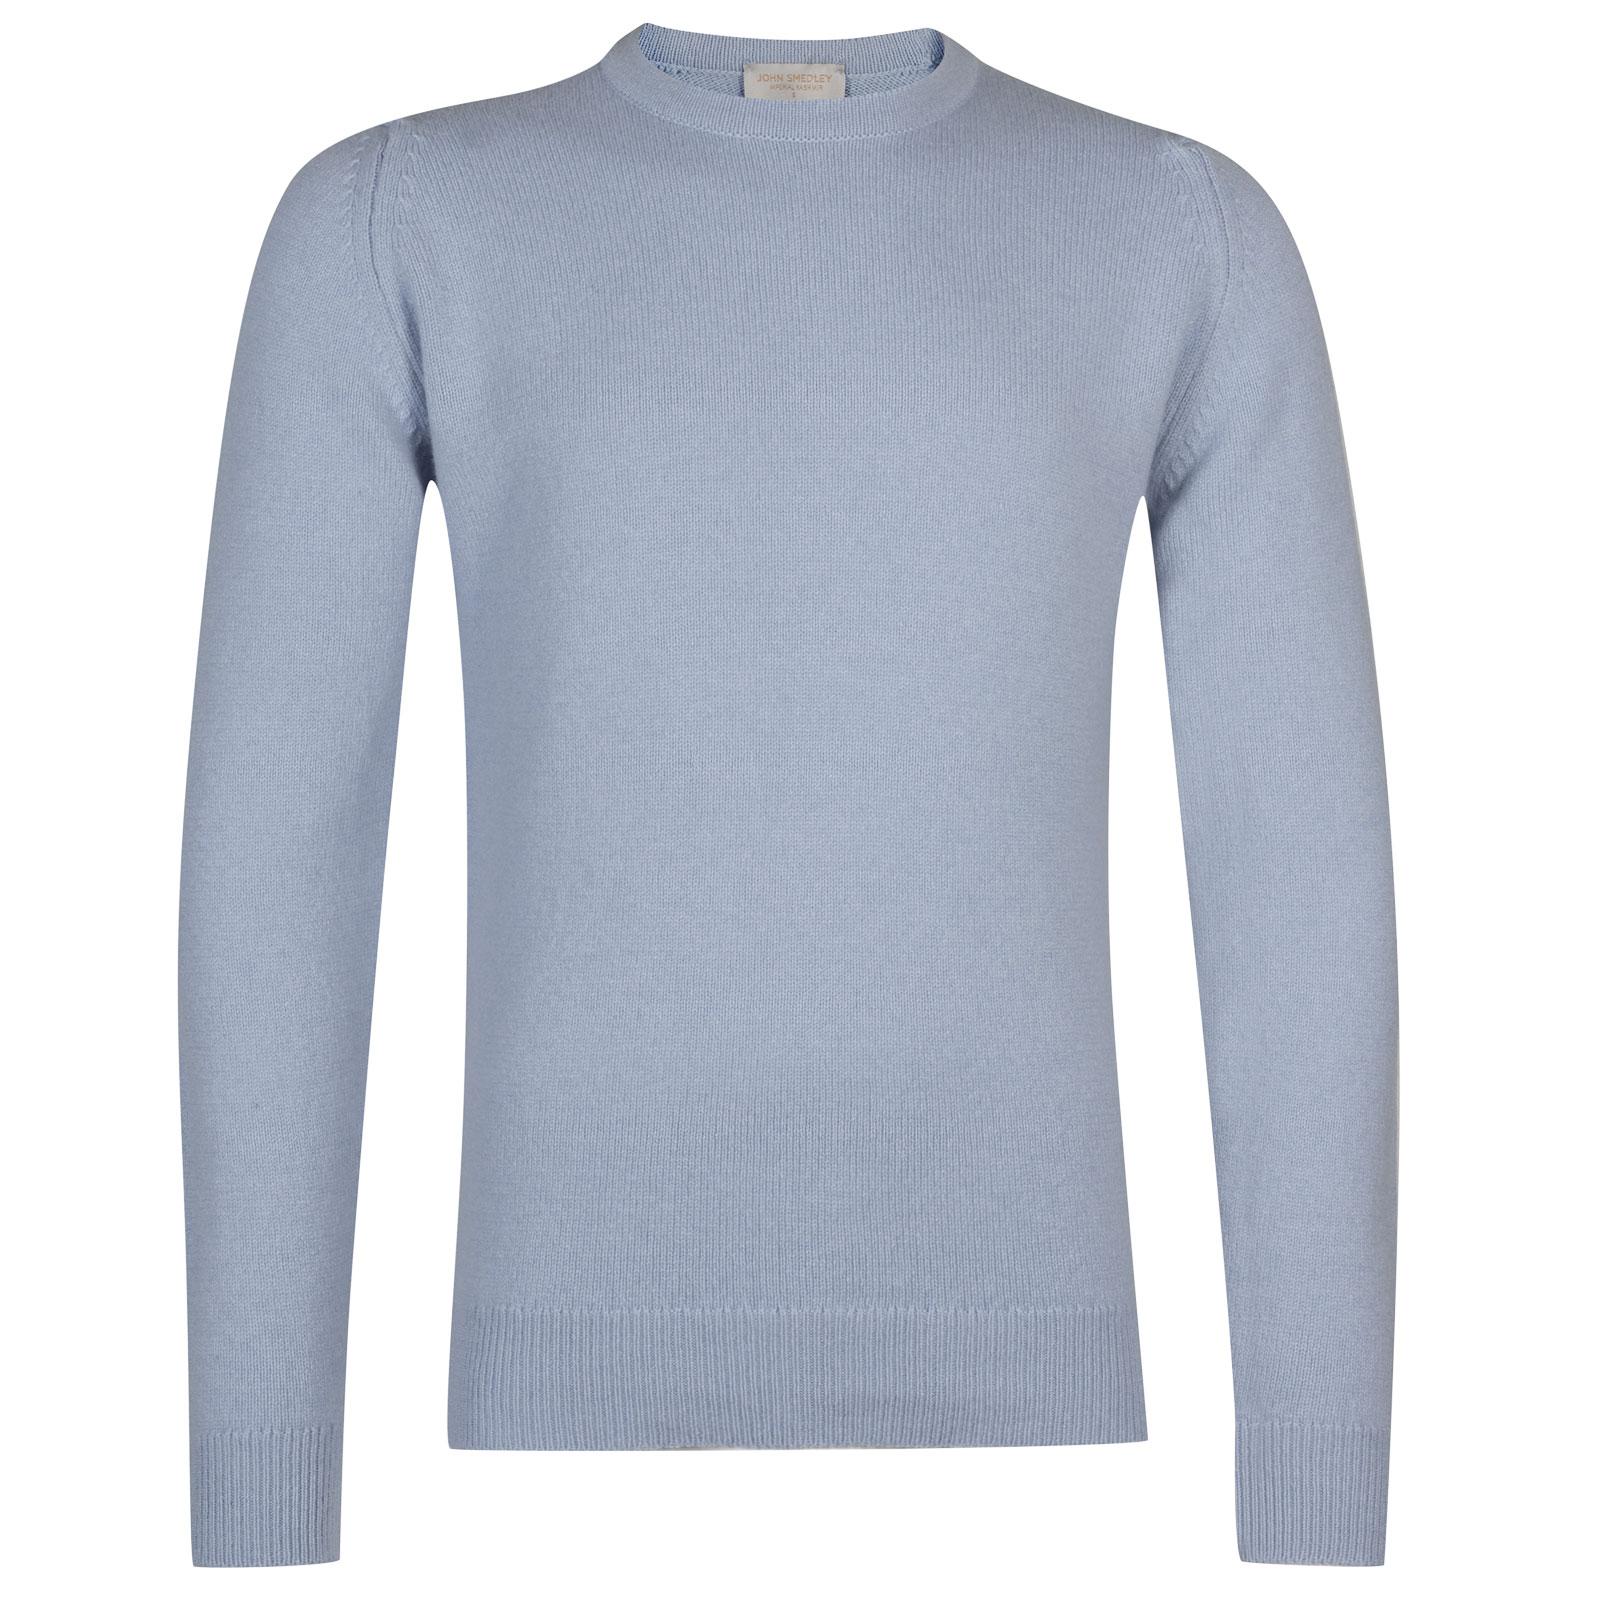 Crowford-nuance-blue-M